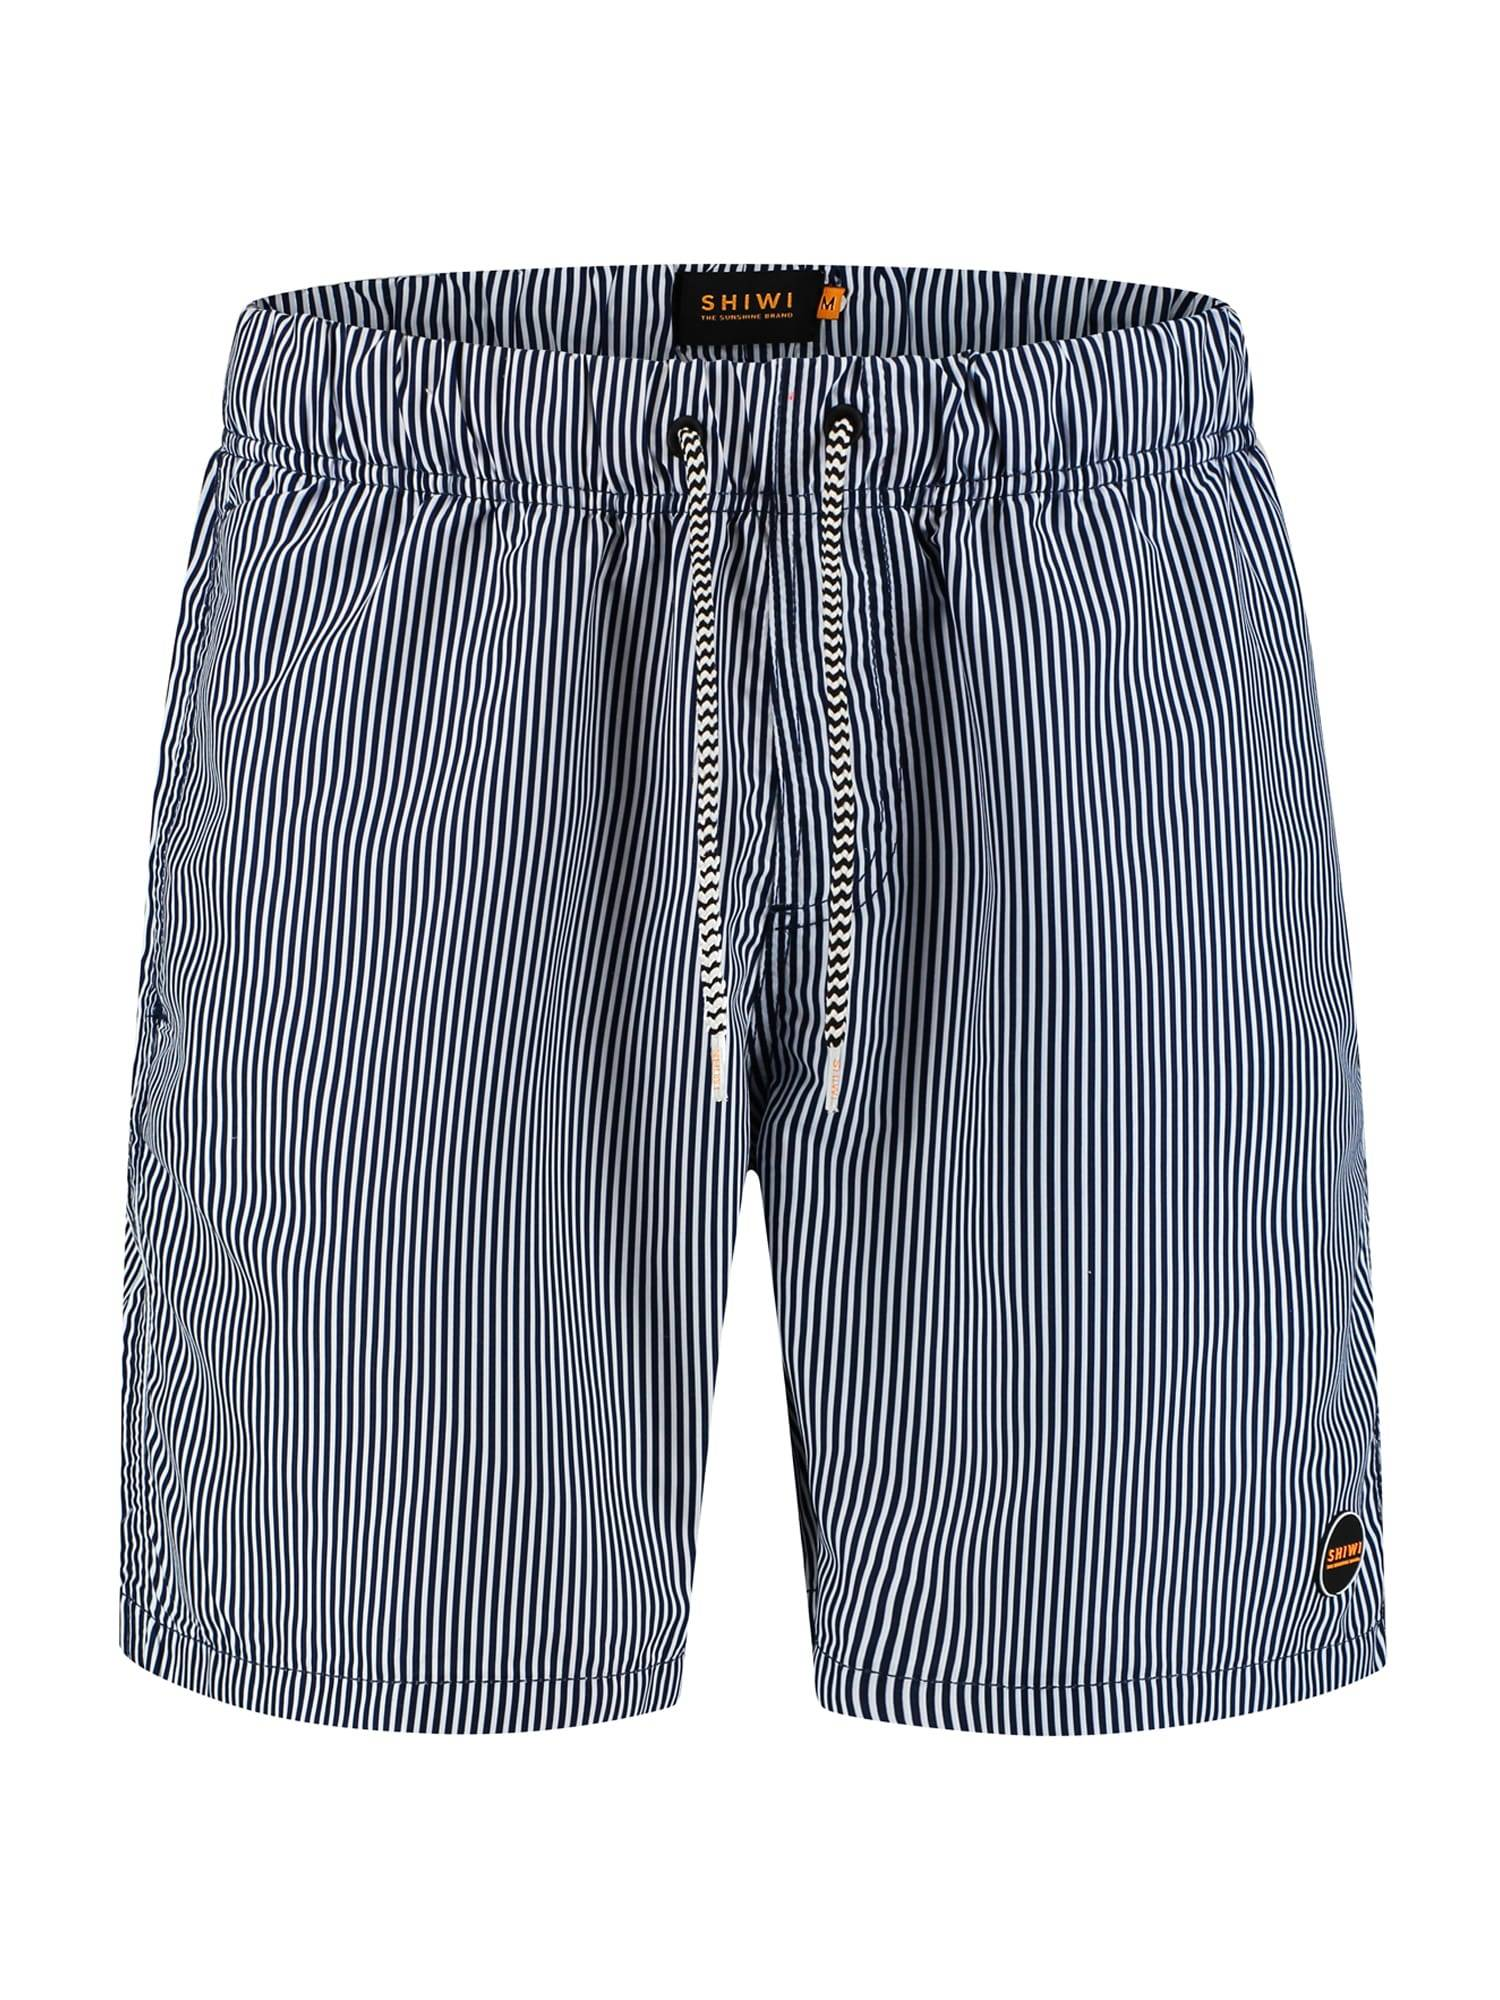 Shiwi Shorts de bain 'Skinny stripe'  - Bleu - Taille: XXXL - male